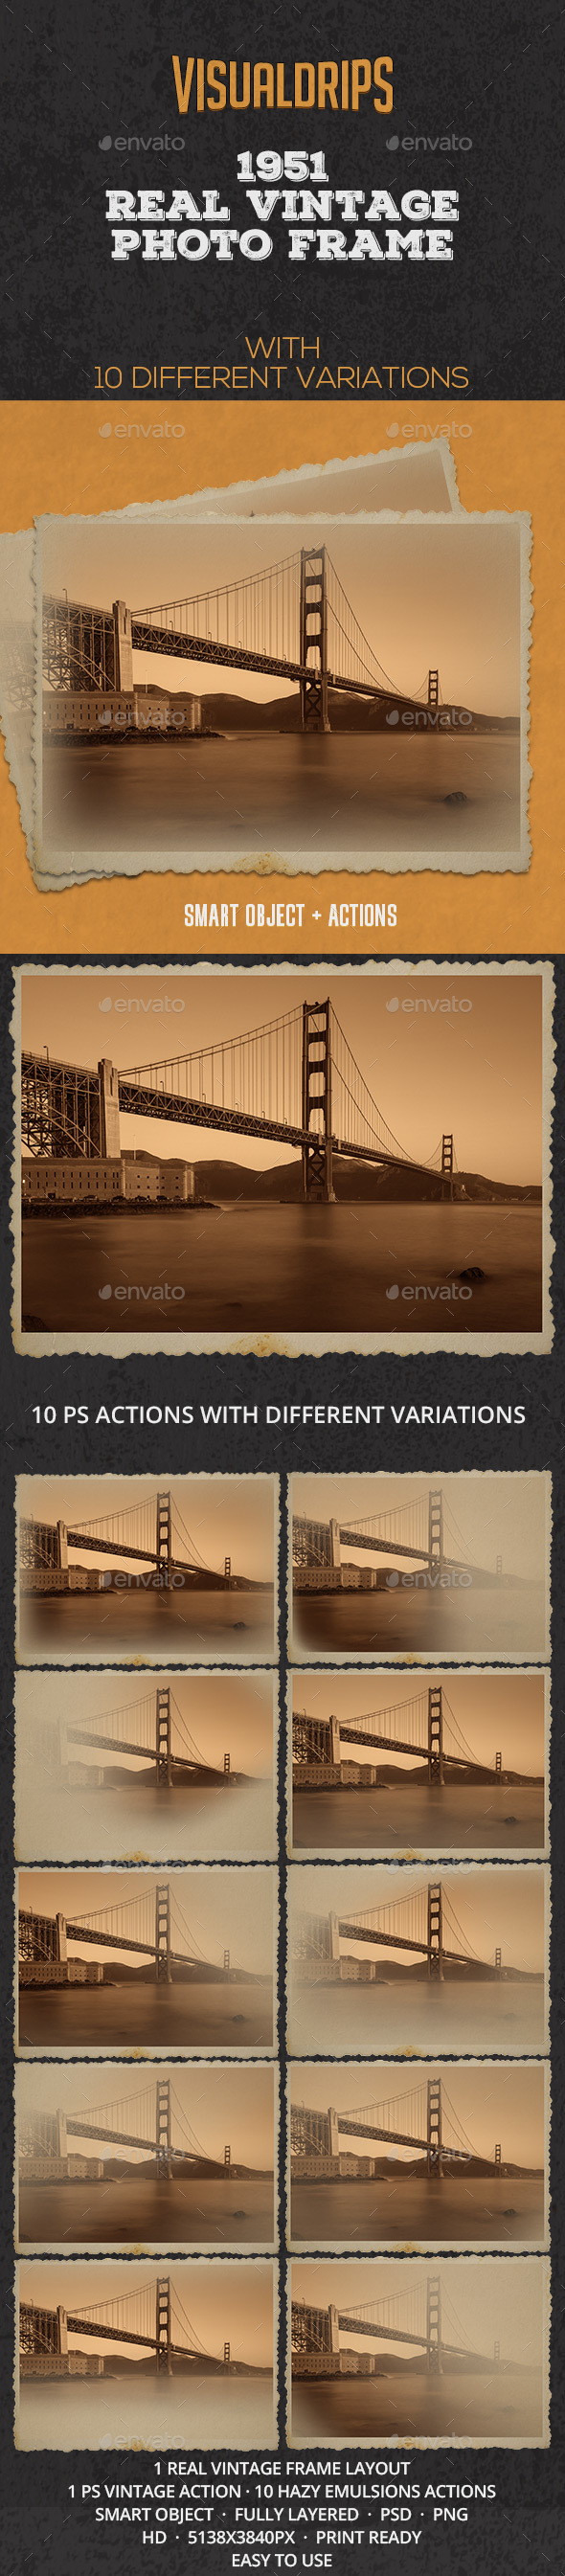 1951 Vintage Frame Photoshop Template - Miscellaneous Photo Templates